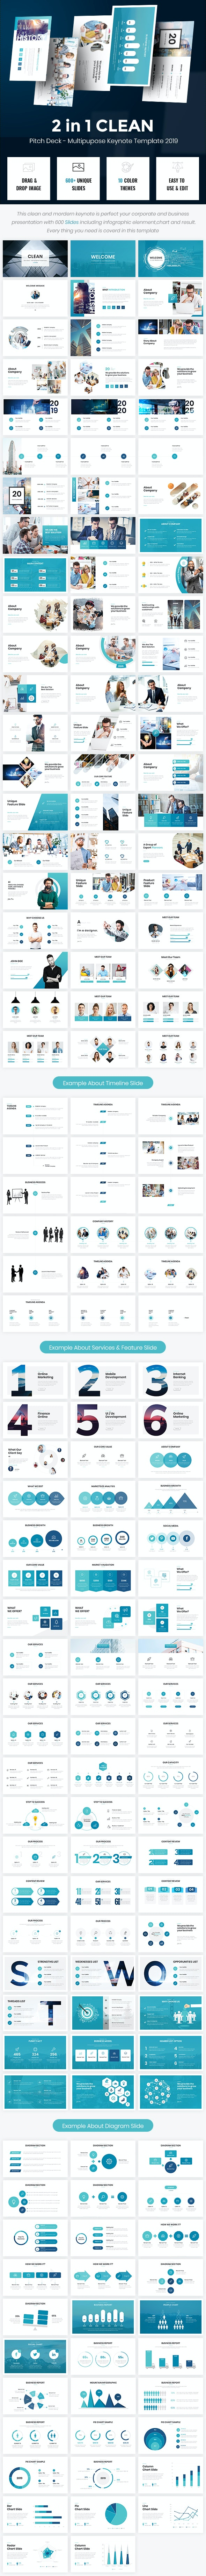 2 in 1 Clean Pitch Deck - Multipurpose Keynote 2019 - Business Keynote Templates